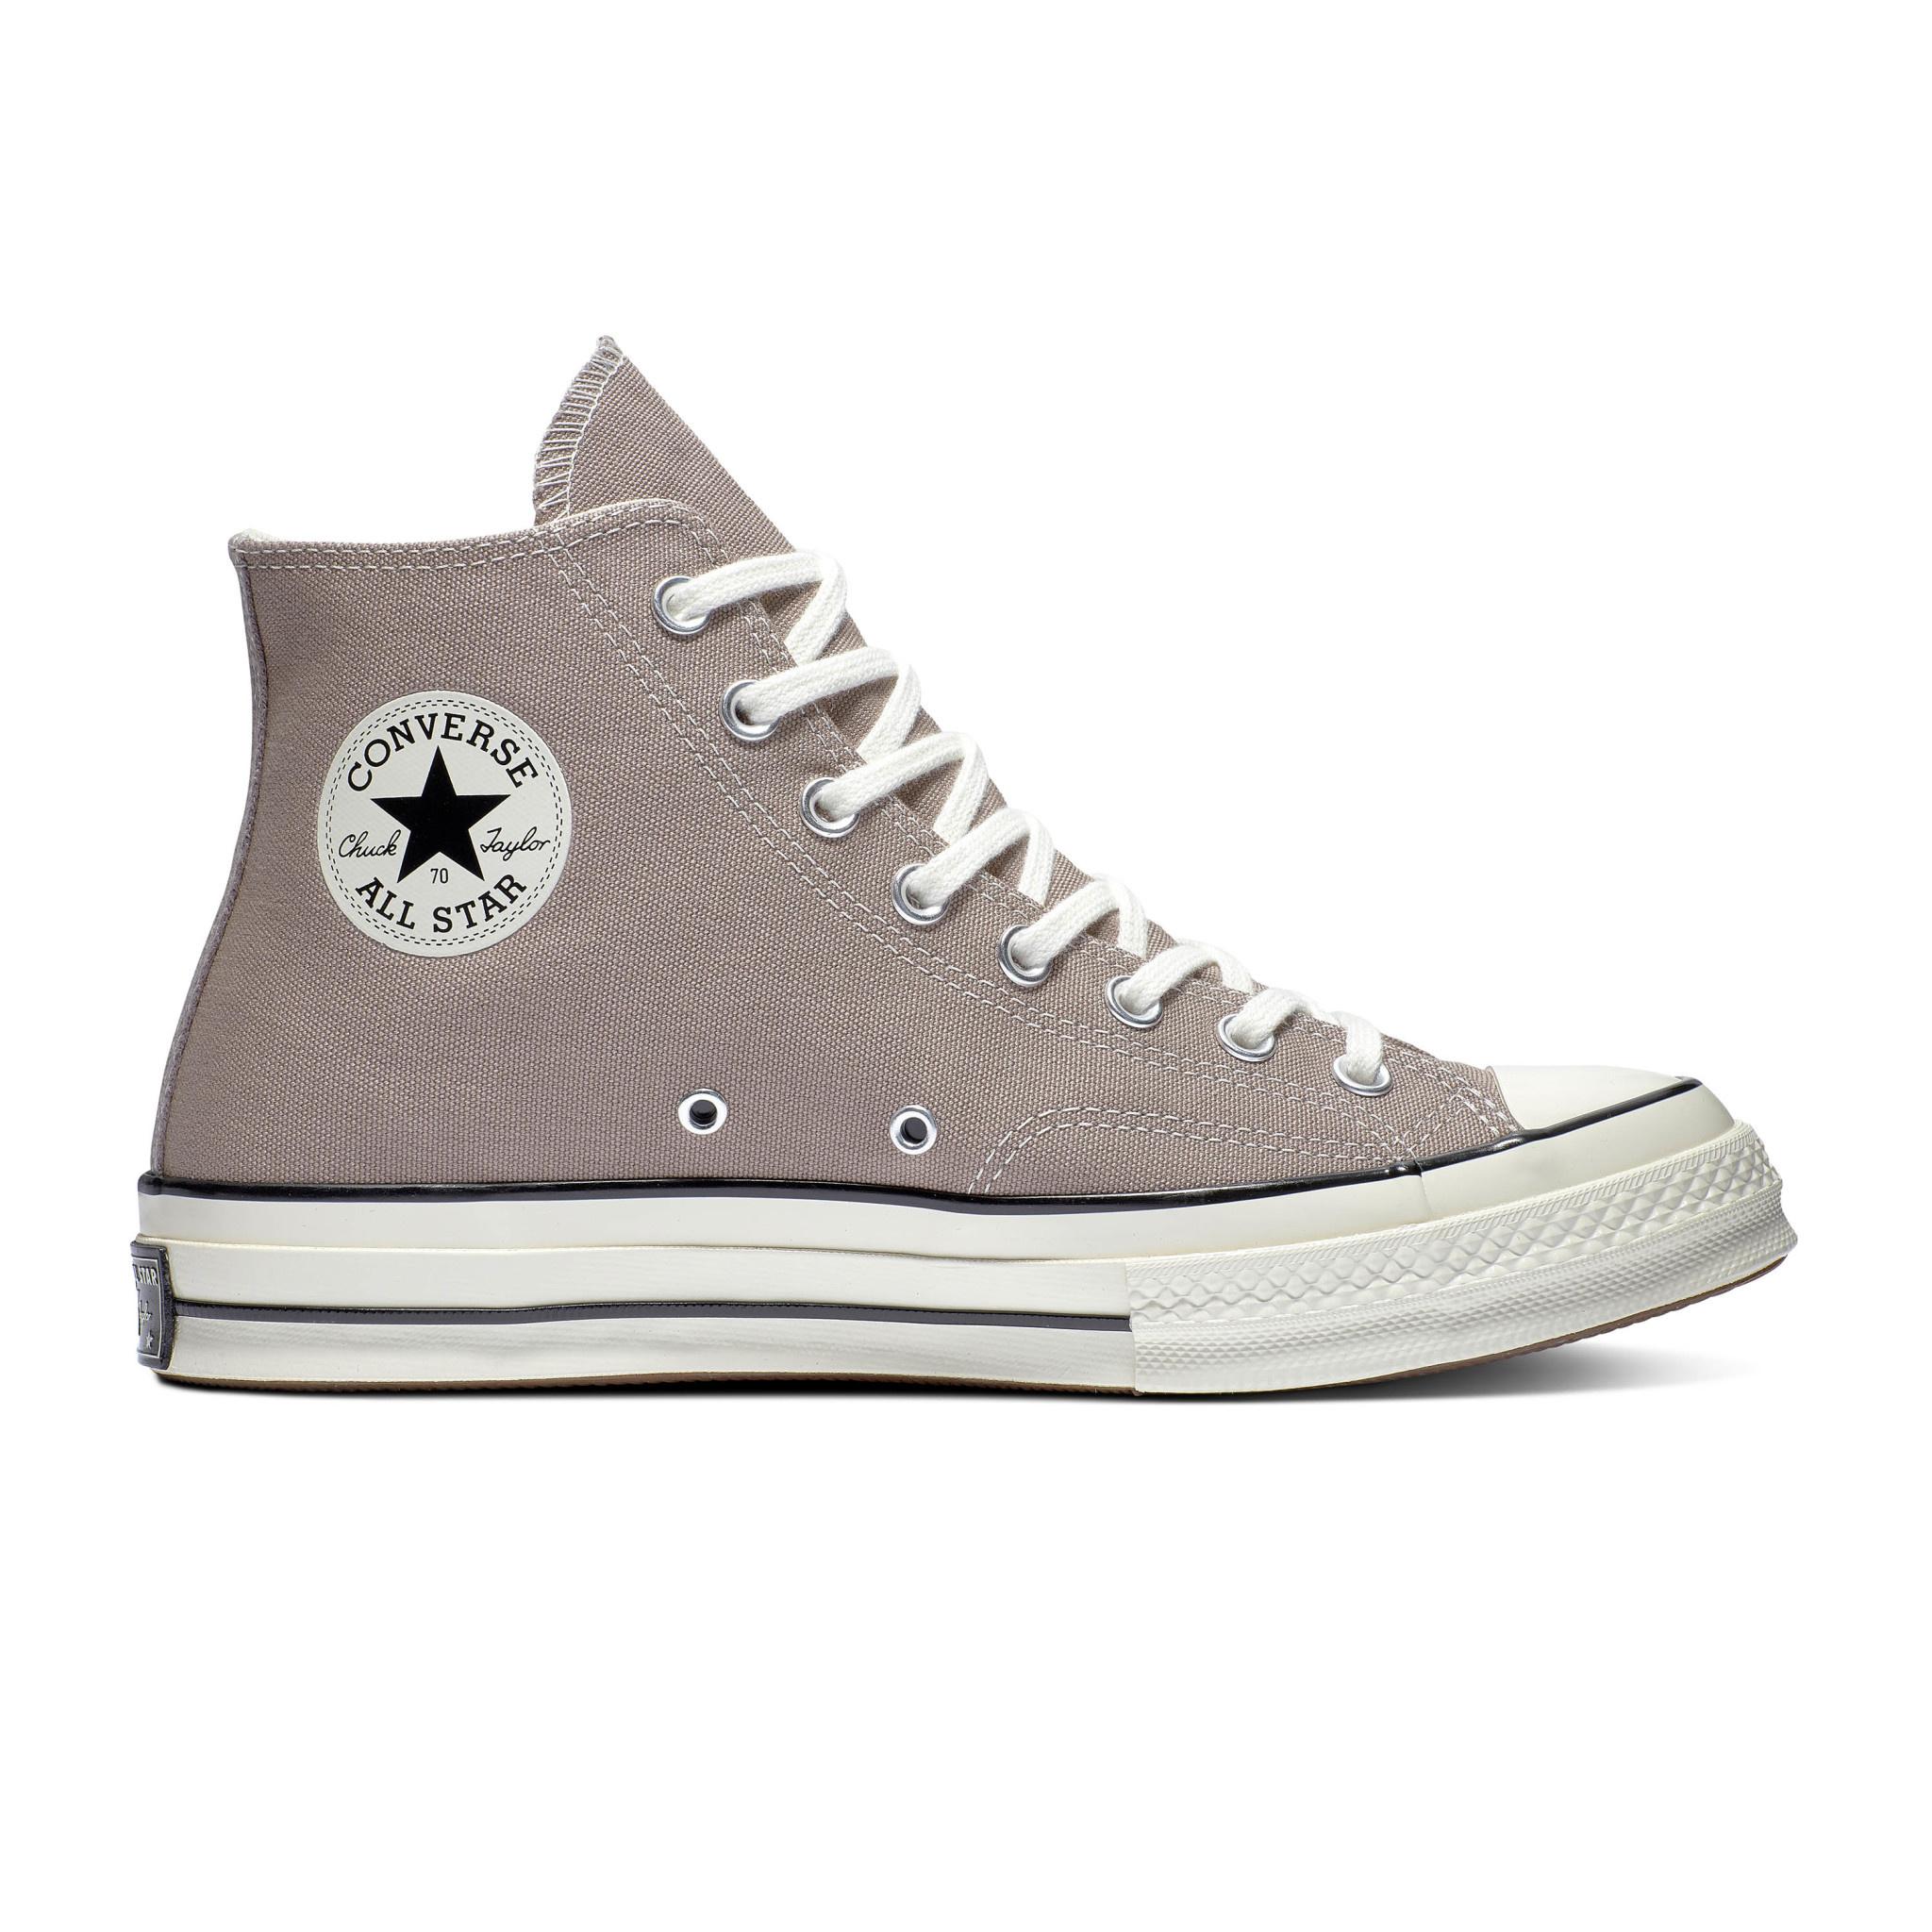 eb7dc2541a RIO X20 Montreal Converse Chuck Taylor All Star Boots4all - Boutique X20 MTL